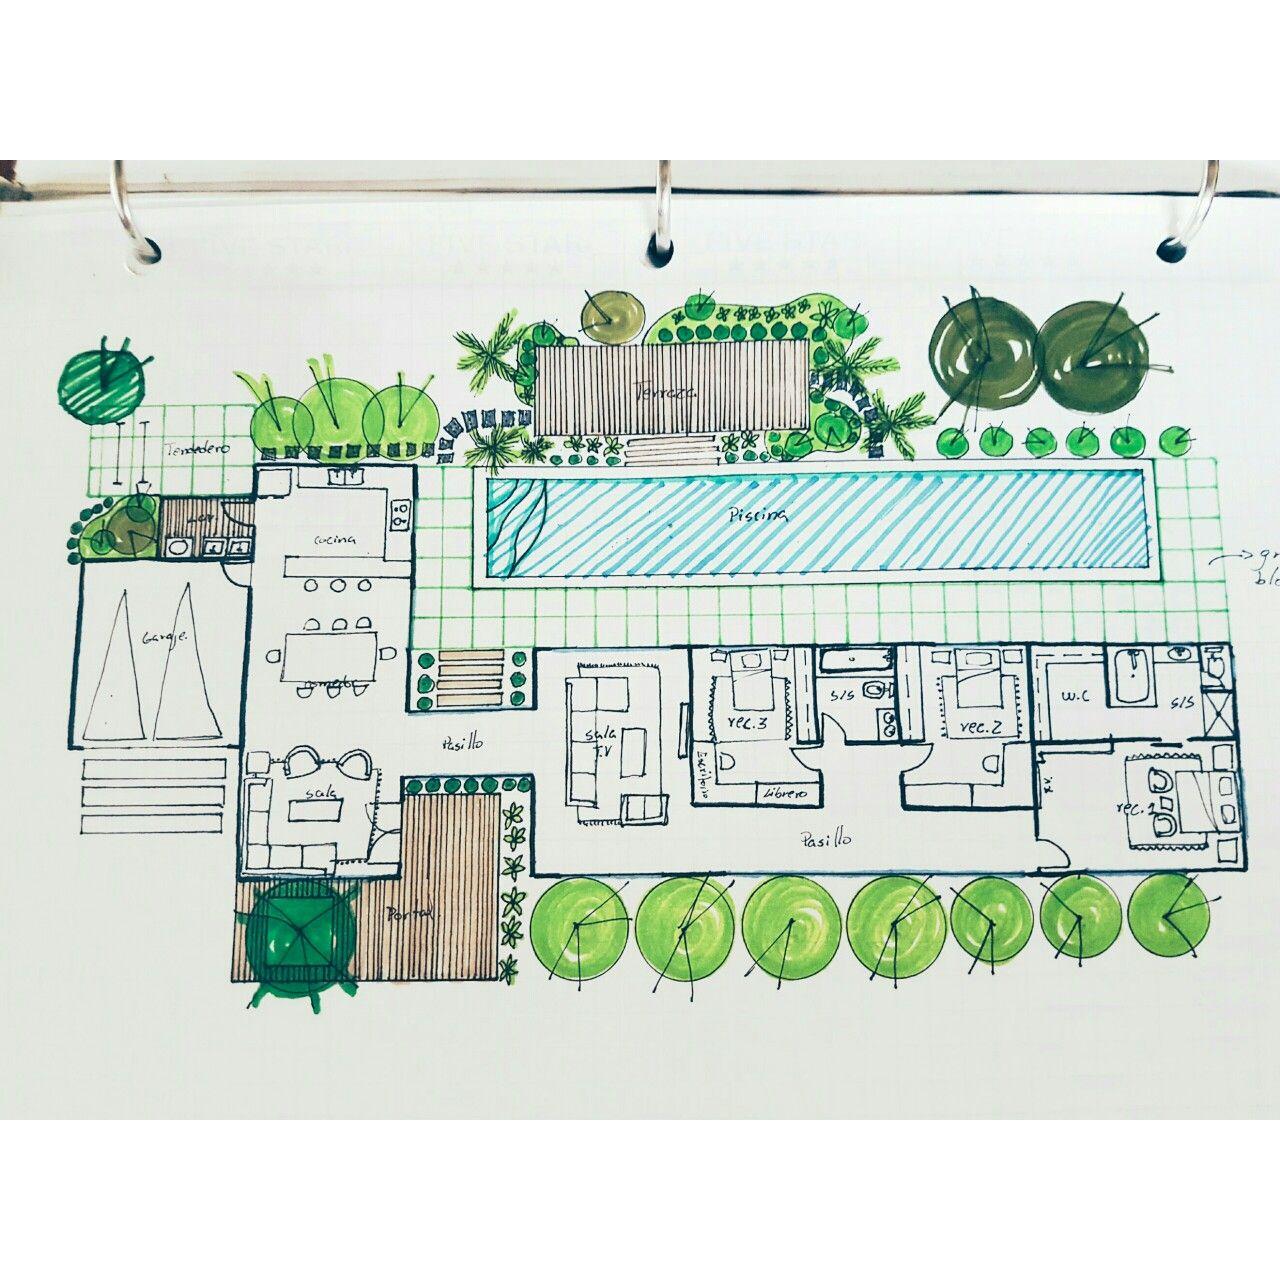 Planta arquitect nica mis bocetos pinterest plantas for Oficinas planta arquitectonica